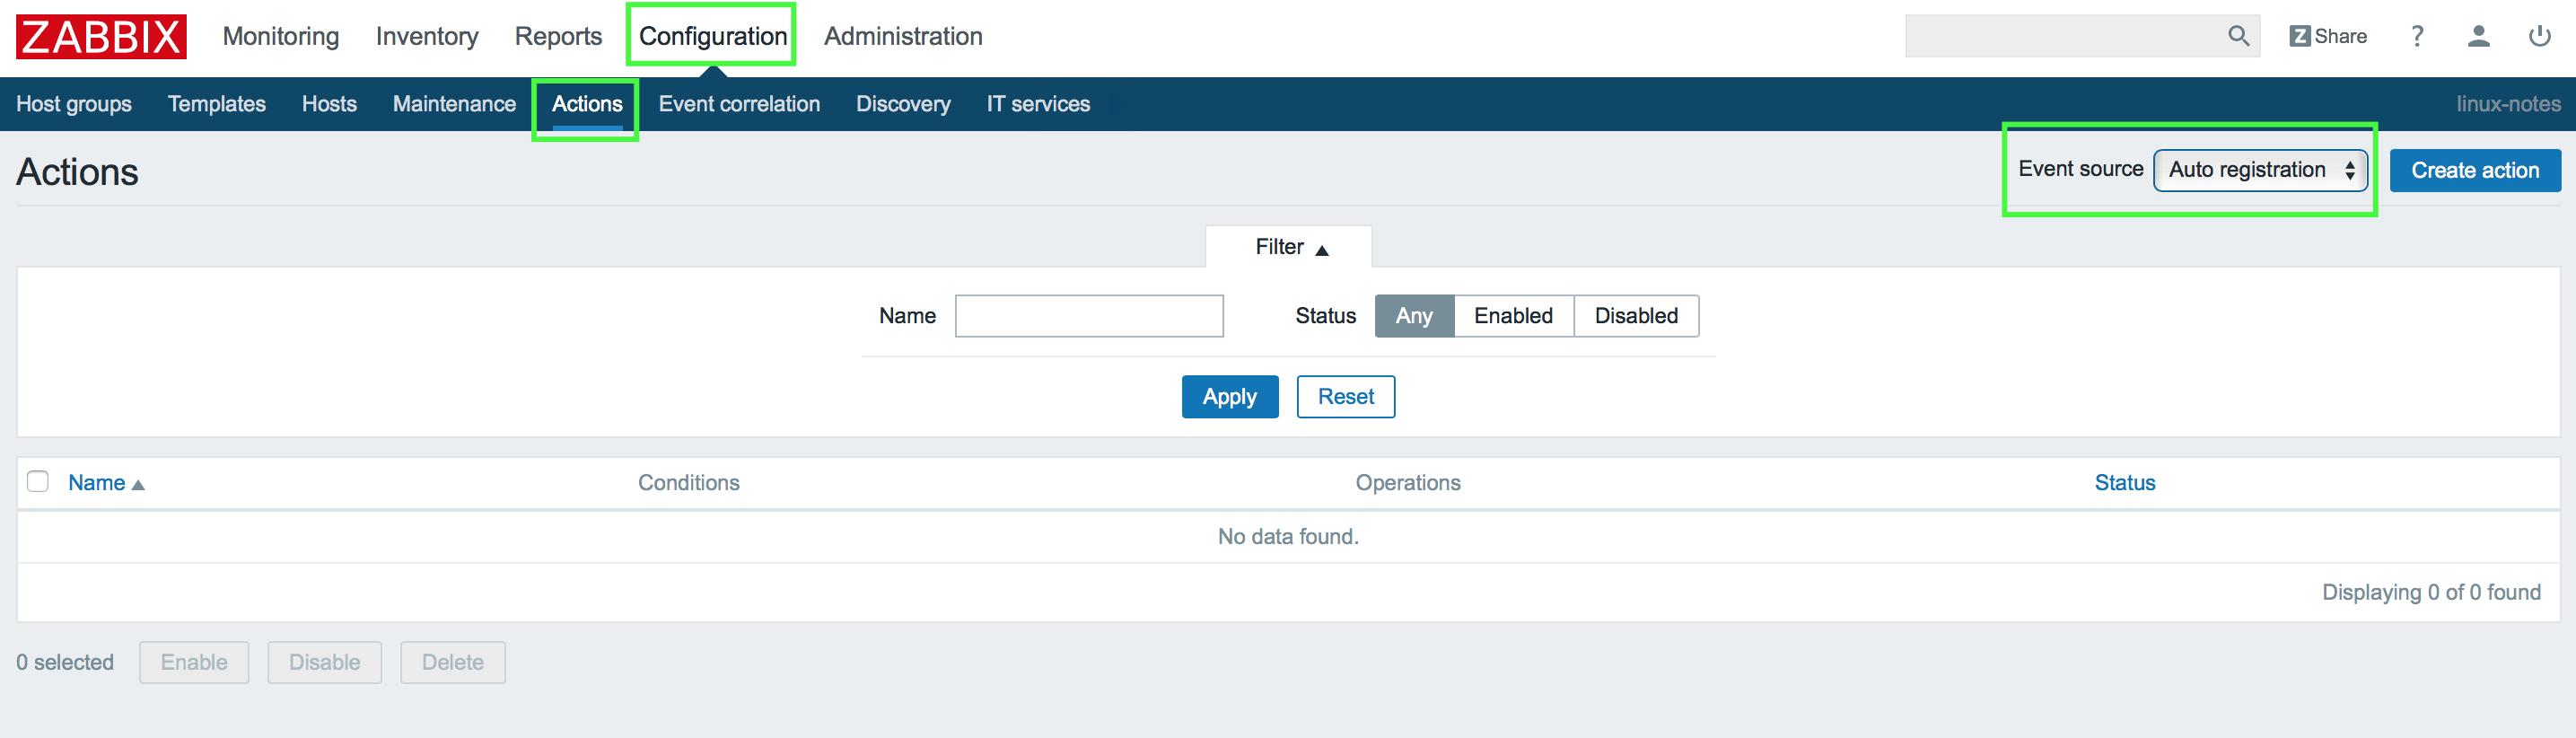 Auto registration в zabbix